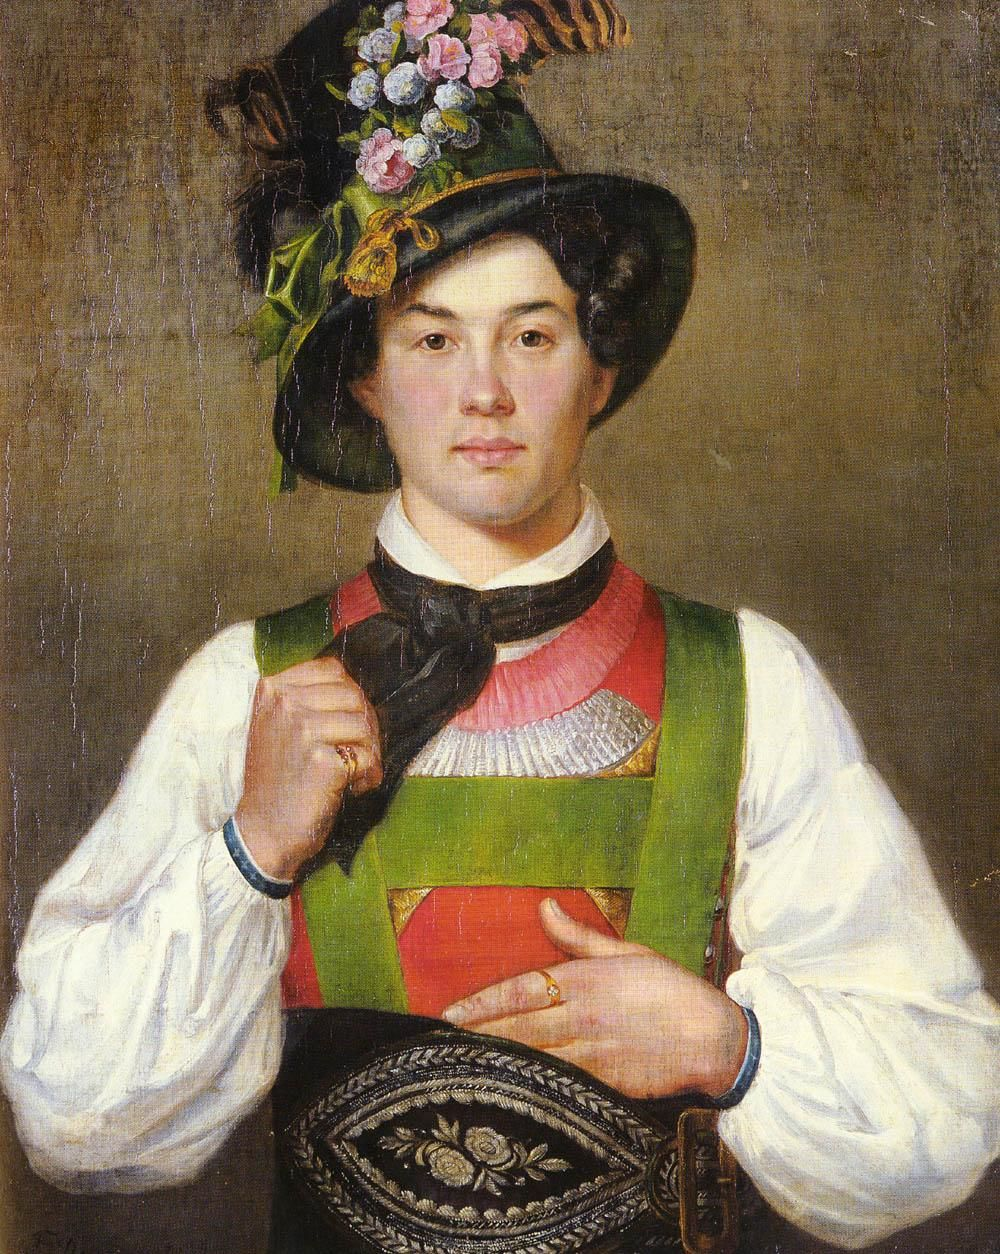 Image result for austrian folk costume man painting